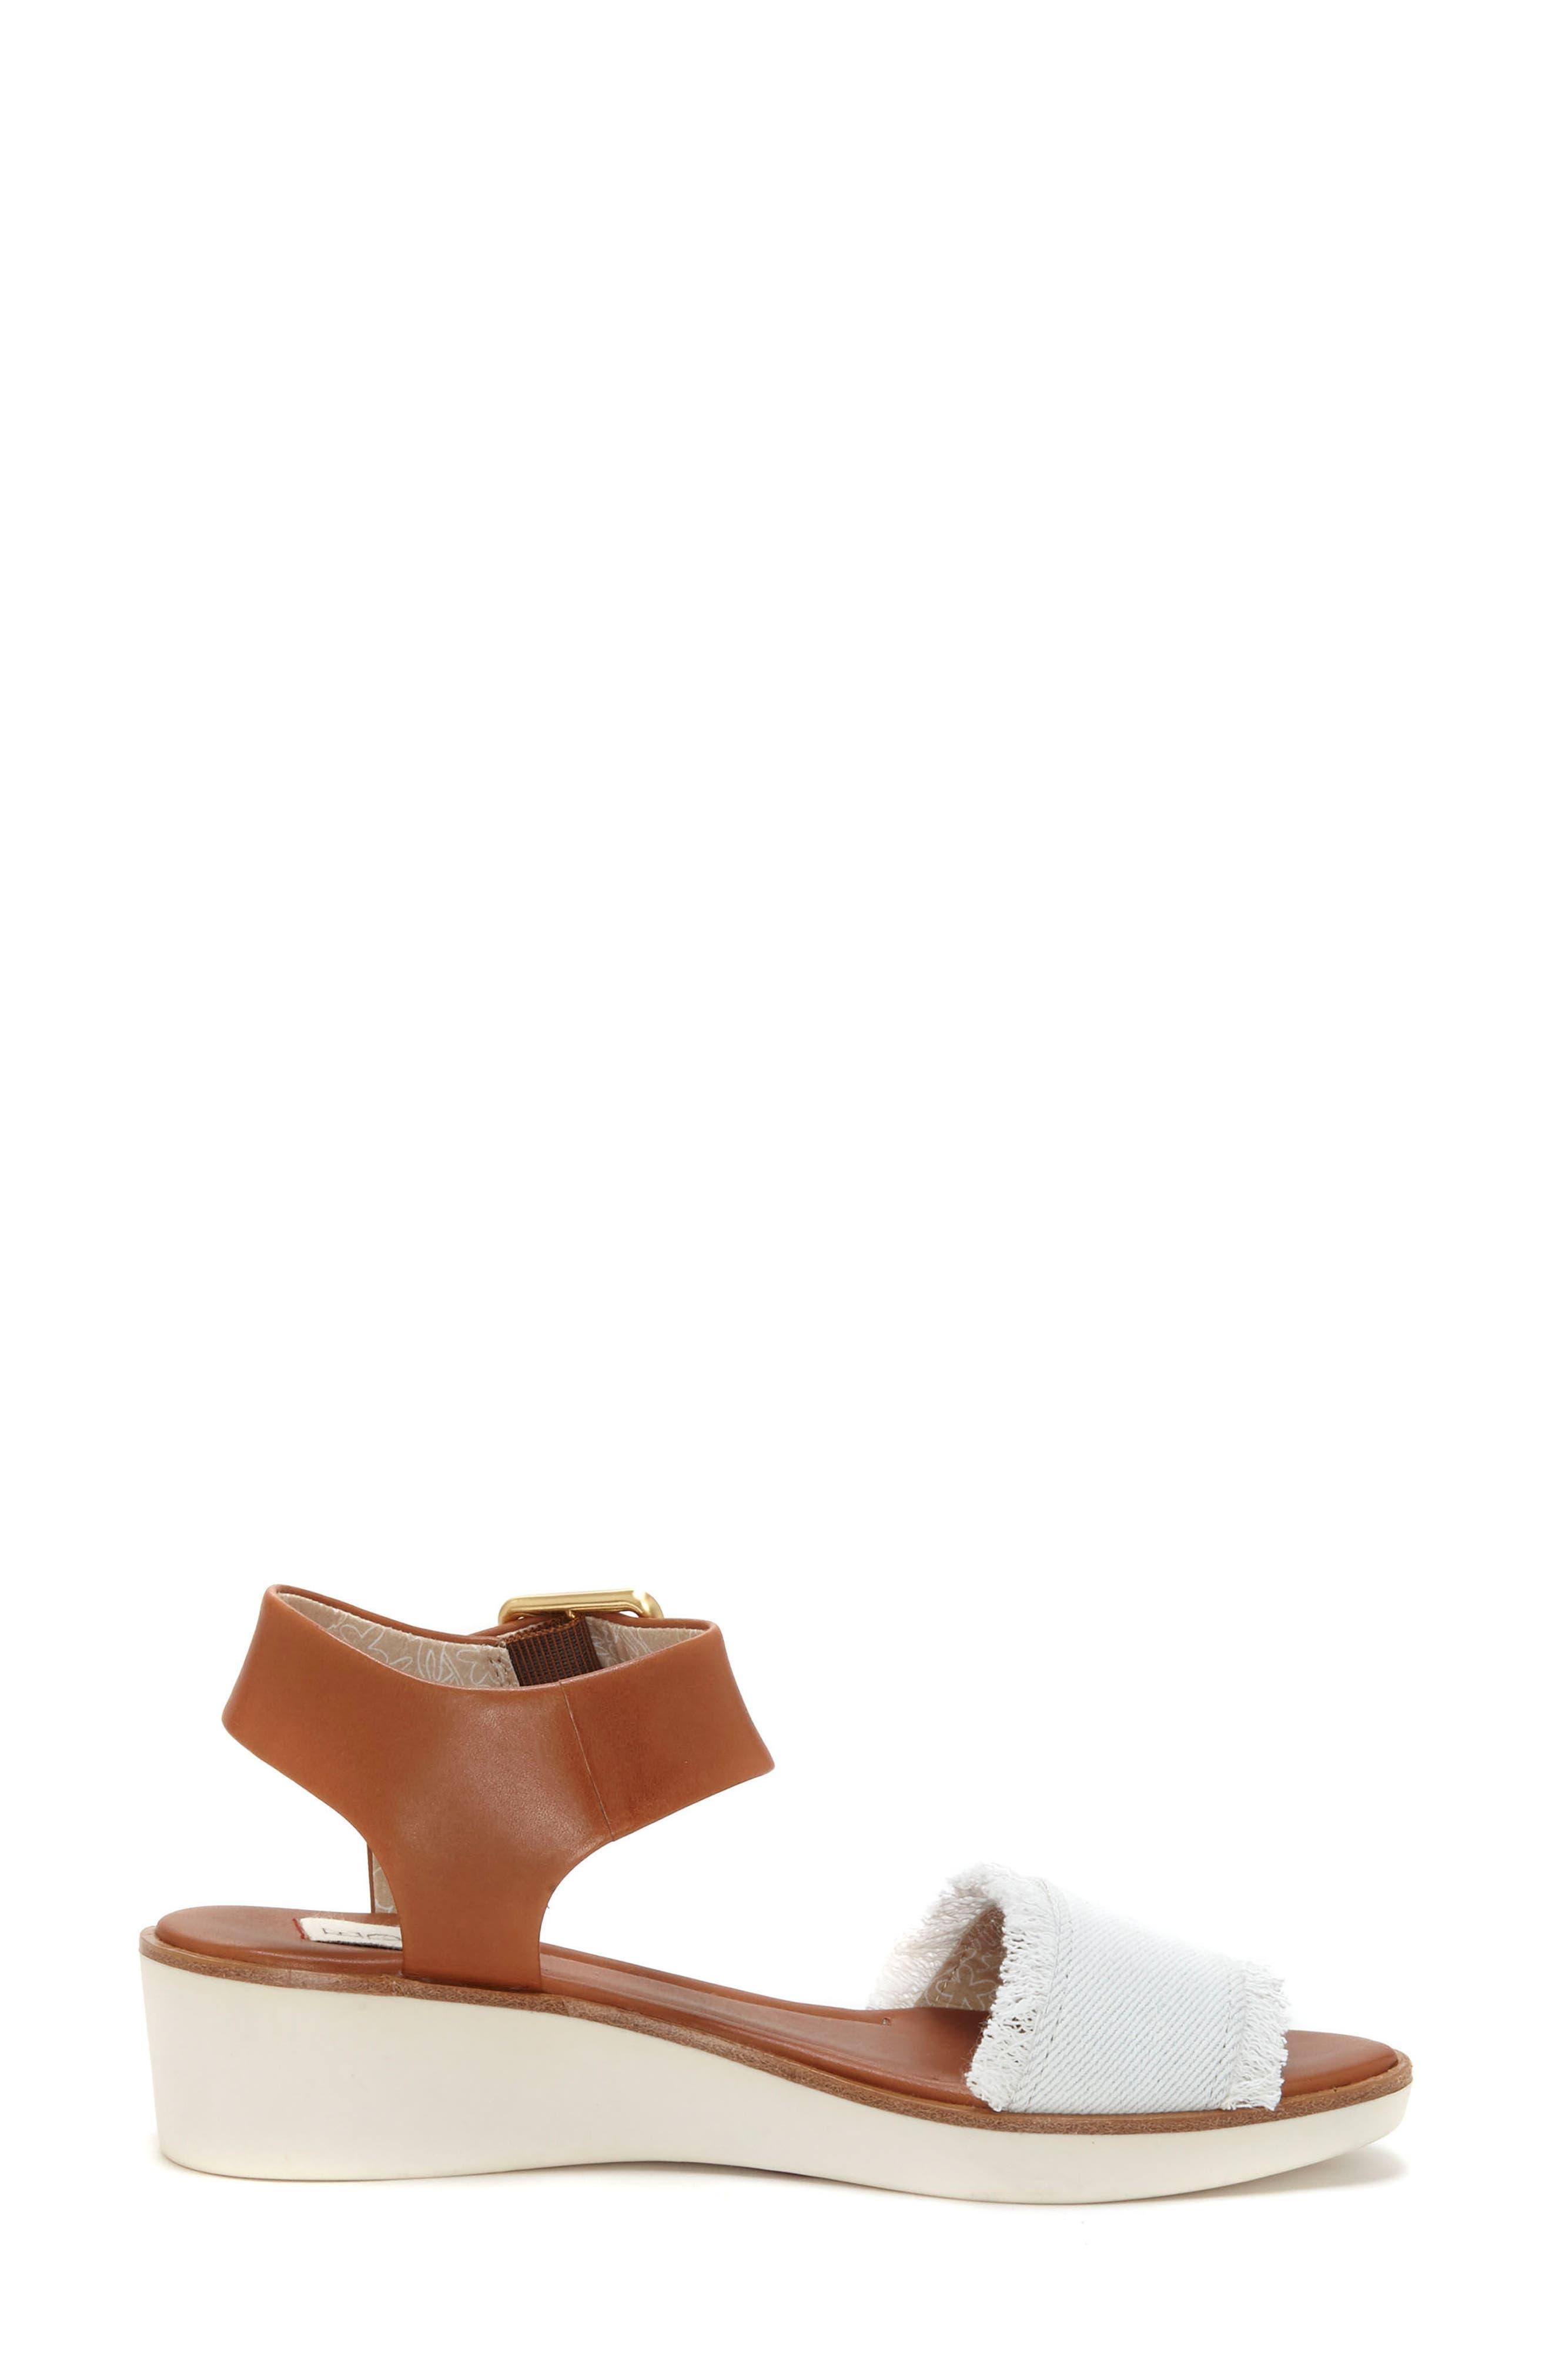 Satiana Sandal,                             Alternate thumbnail 3, color,                             PURE WHITE DENIM FABRIC